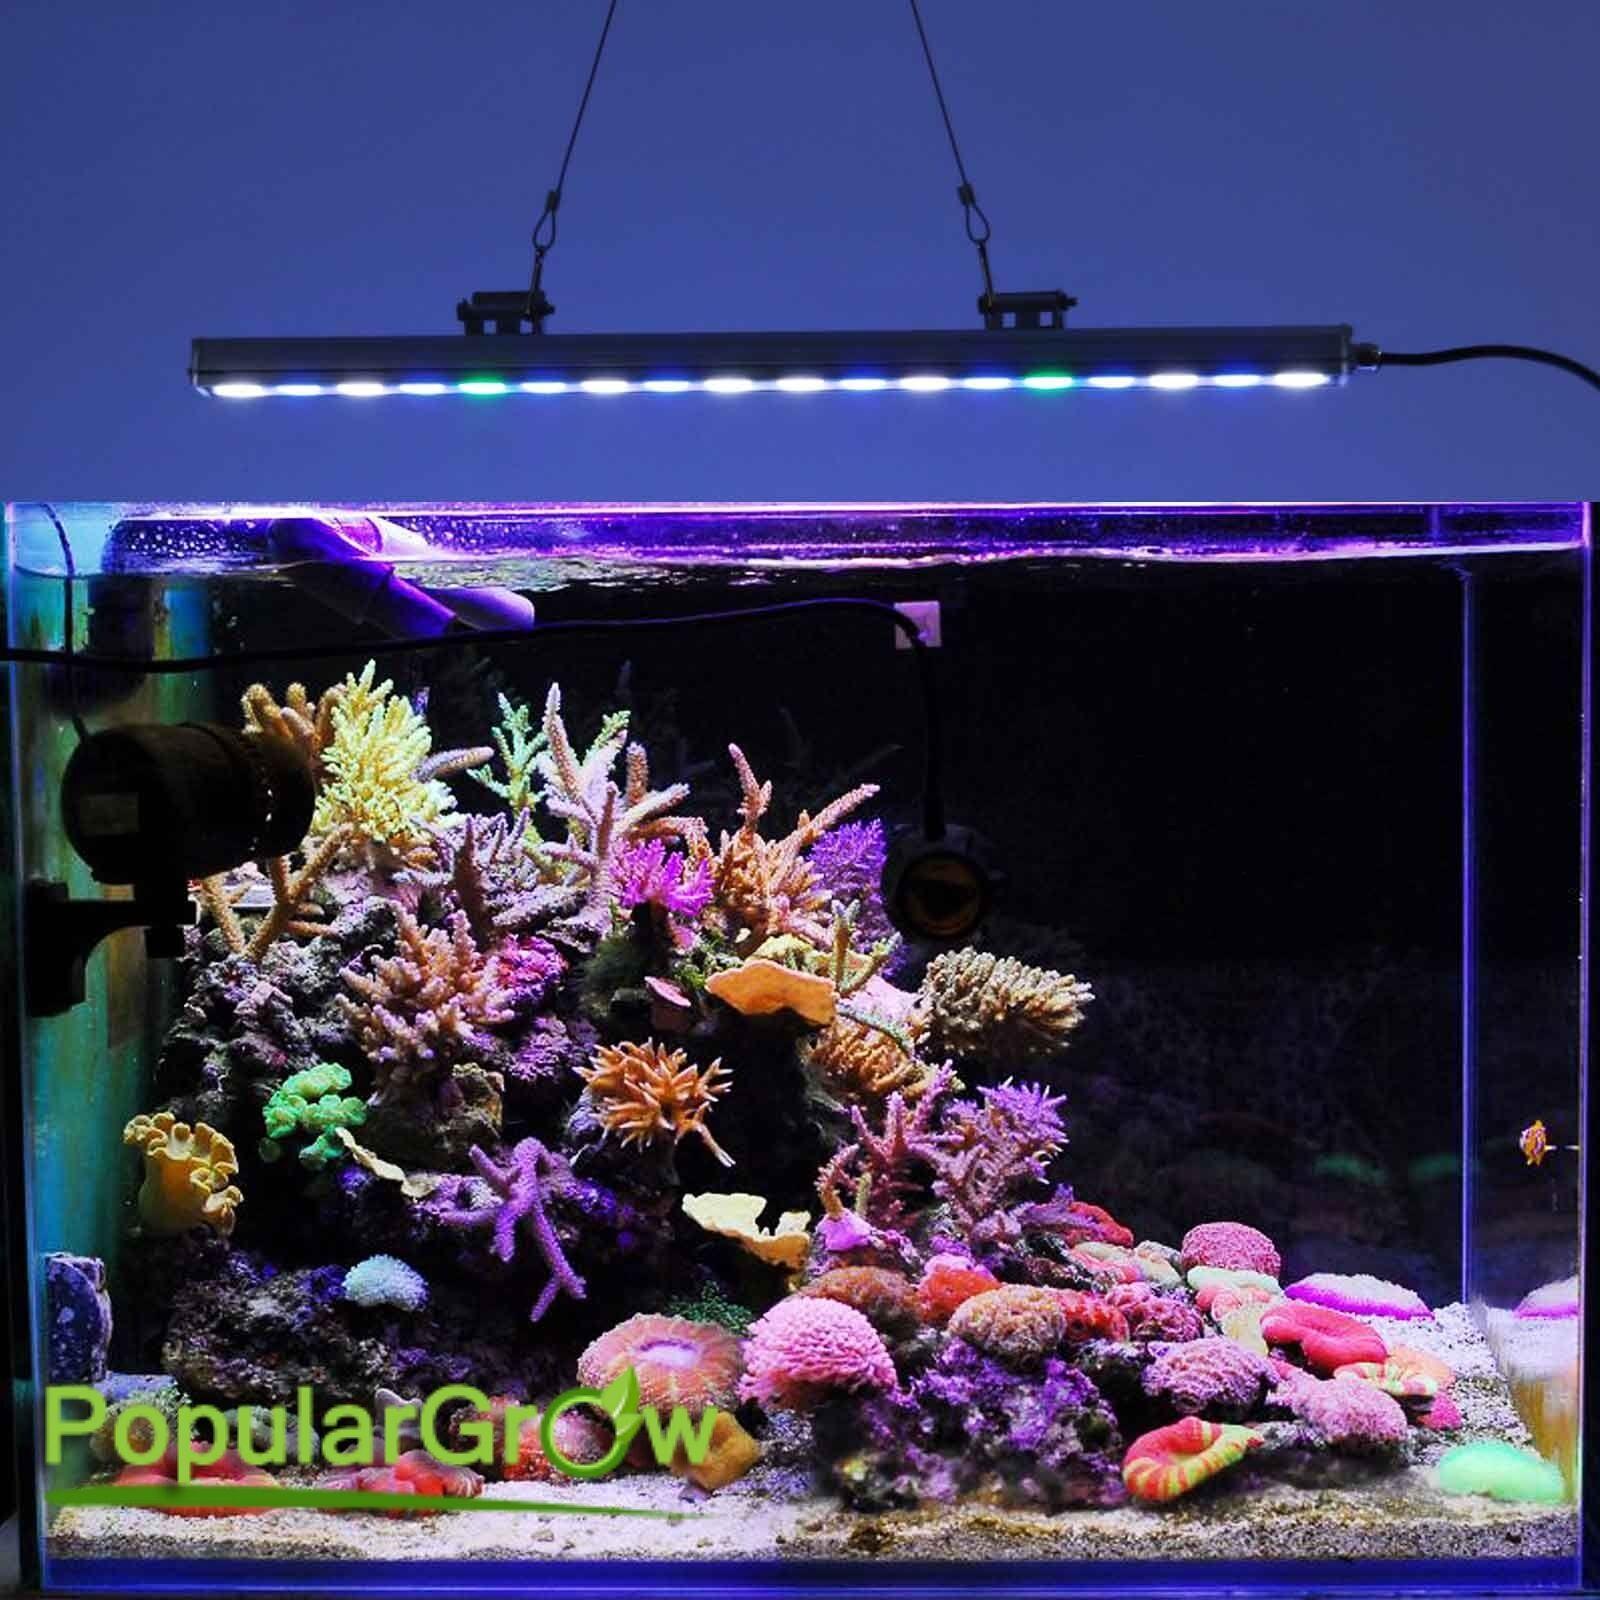 54w led aquarium strip light bar coral reef fish tank supplement lighting growth